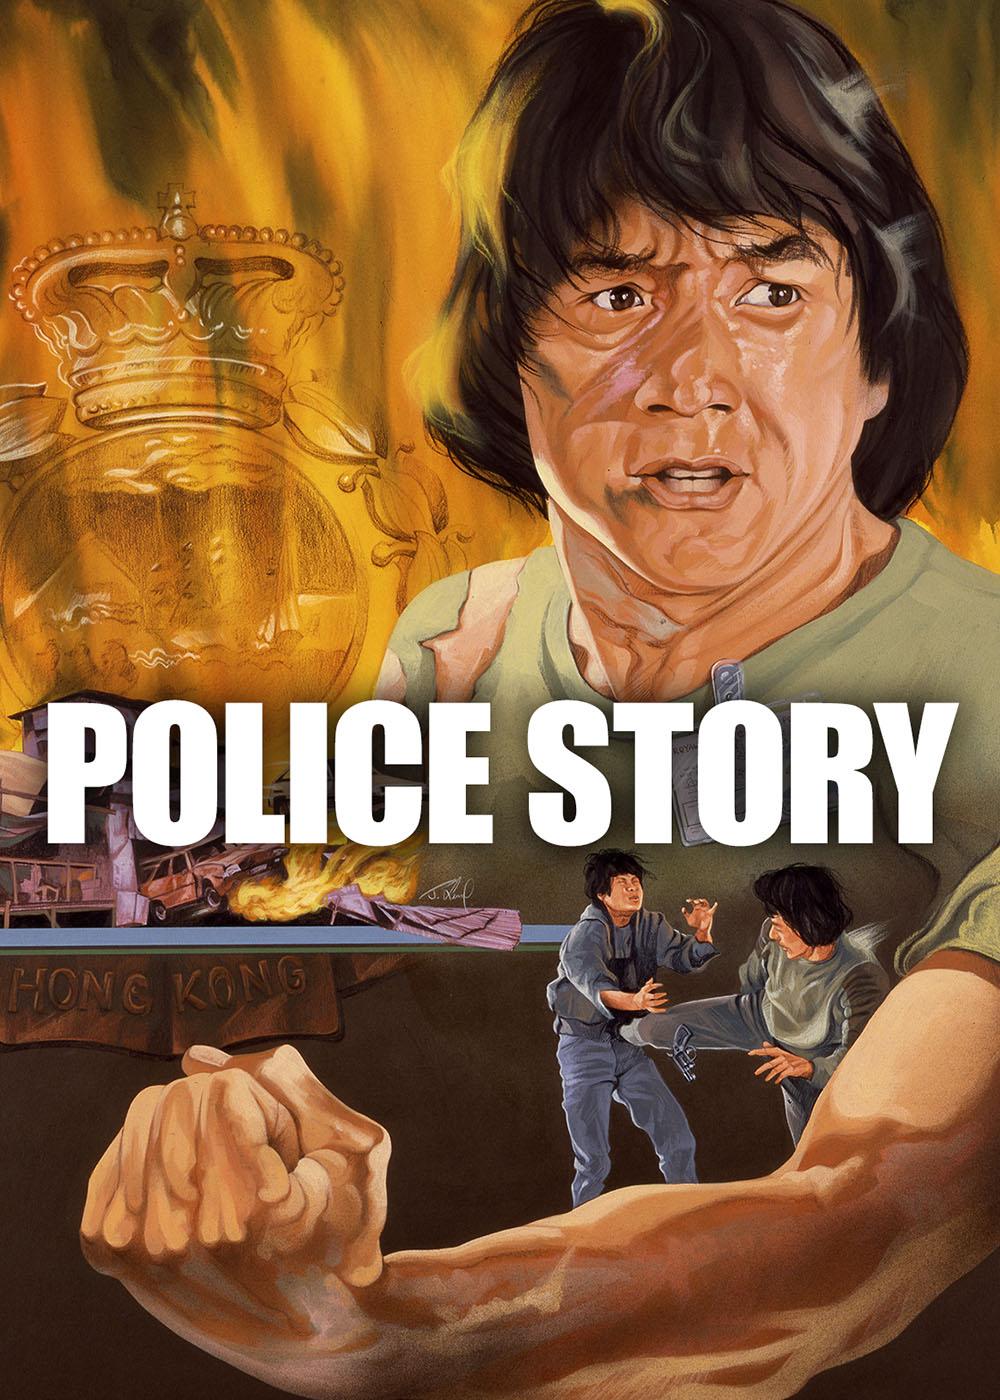 policestory_poster.jpg